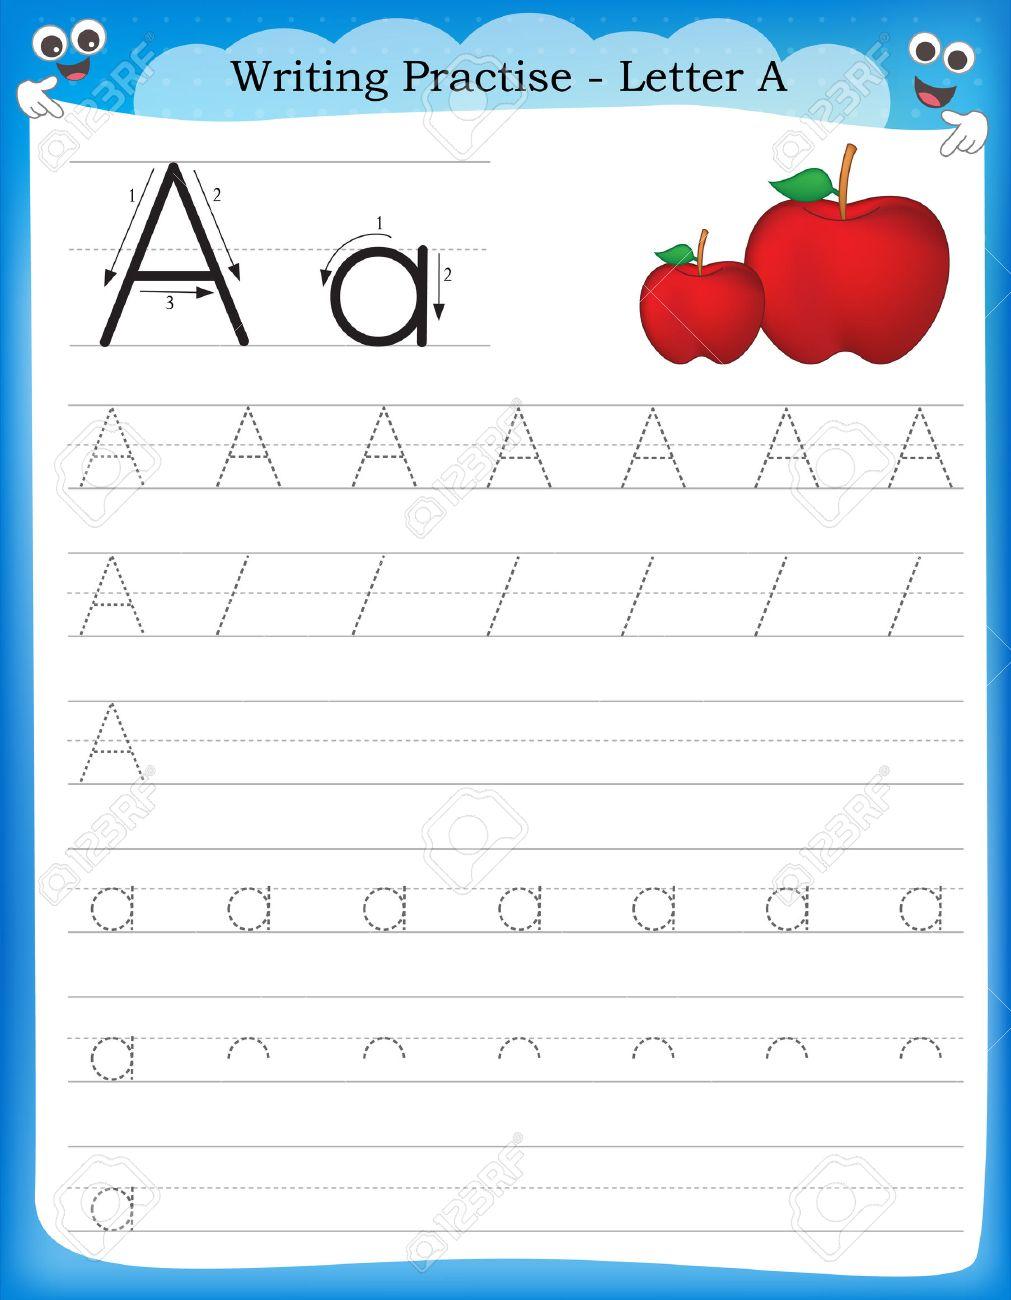 Writing Practice Letter A Printable Worksheet For Preschool ...